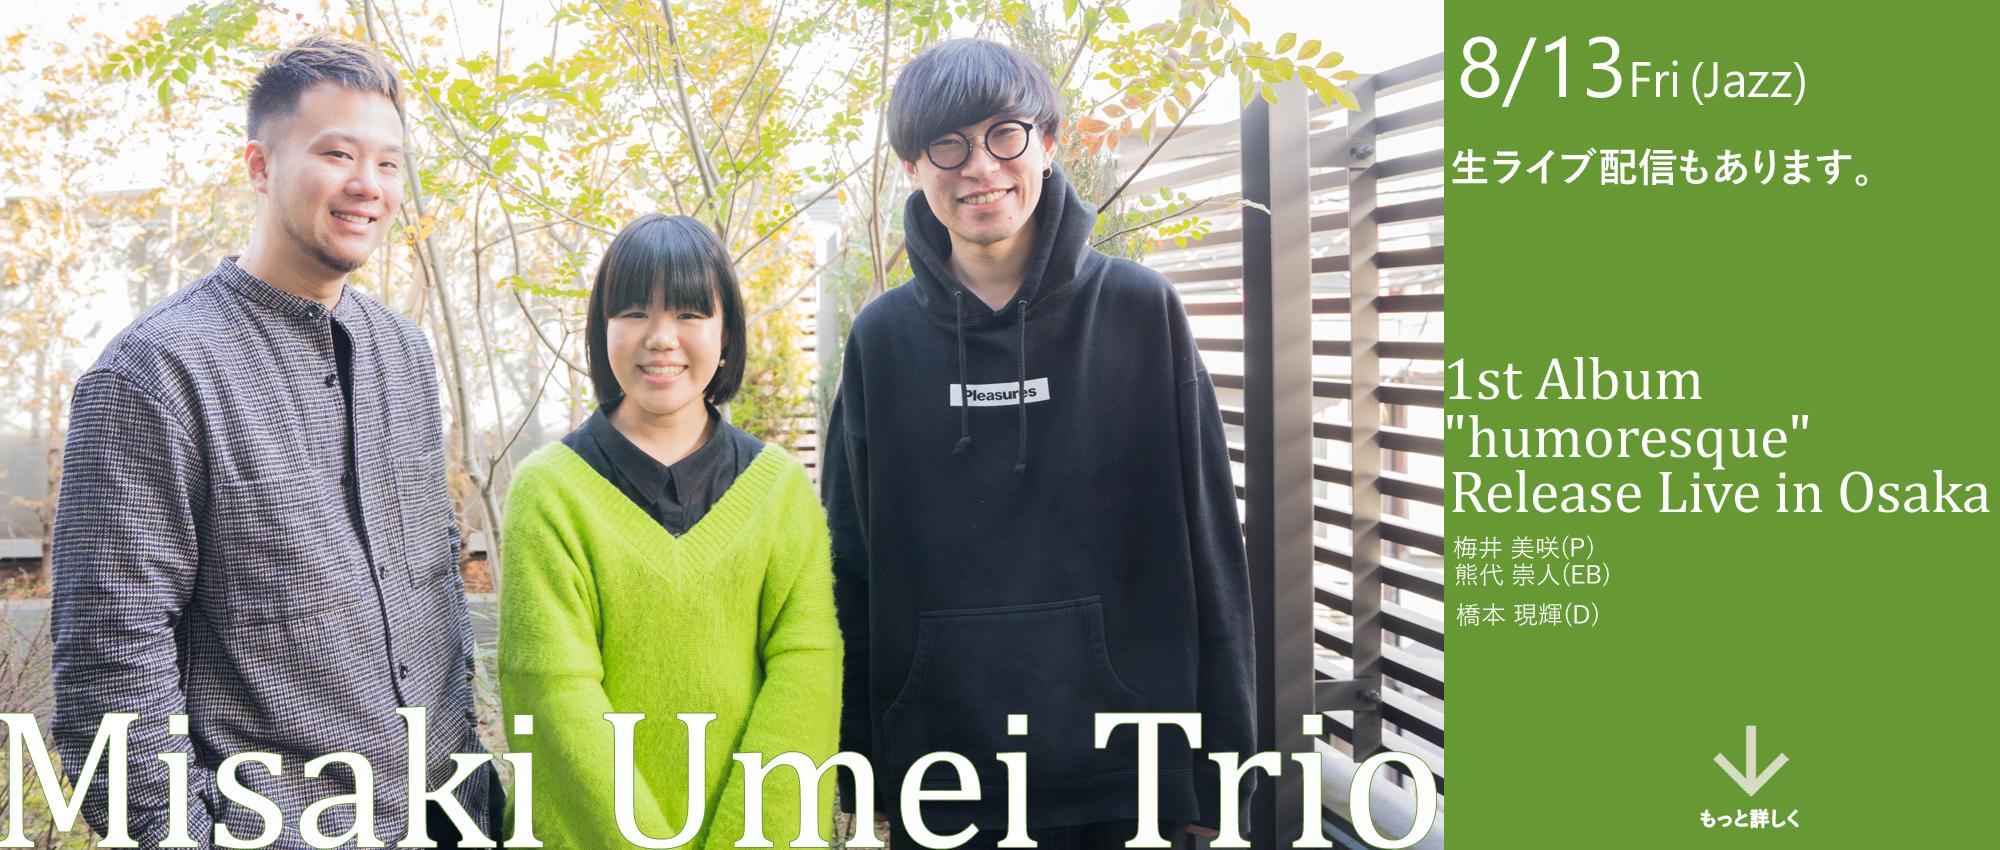 Misaki Umei Trio 1st Album『humoresque』Release Live in Osaka